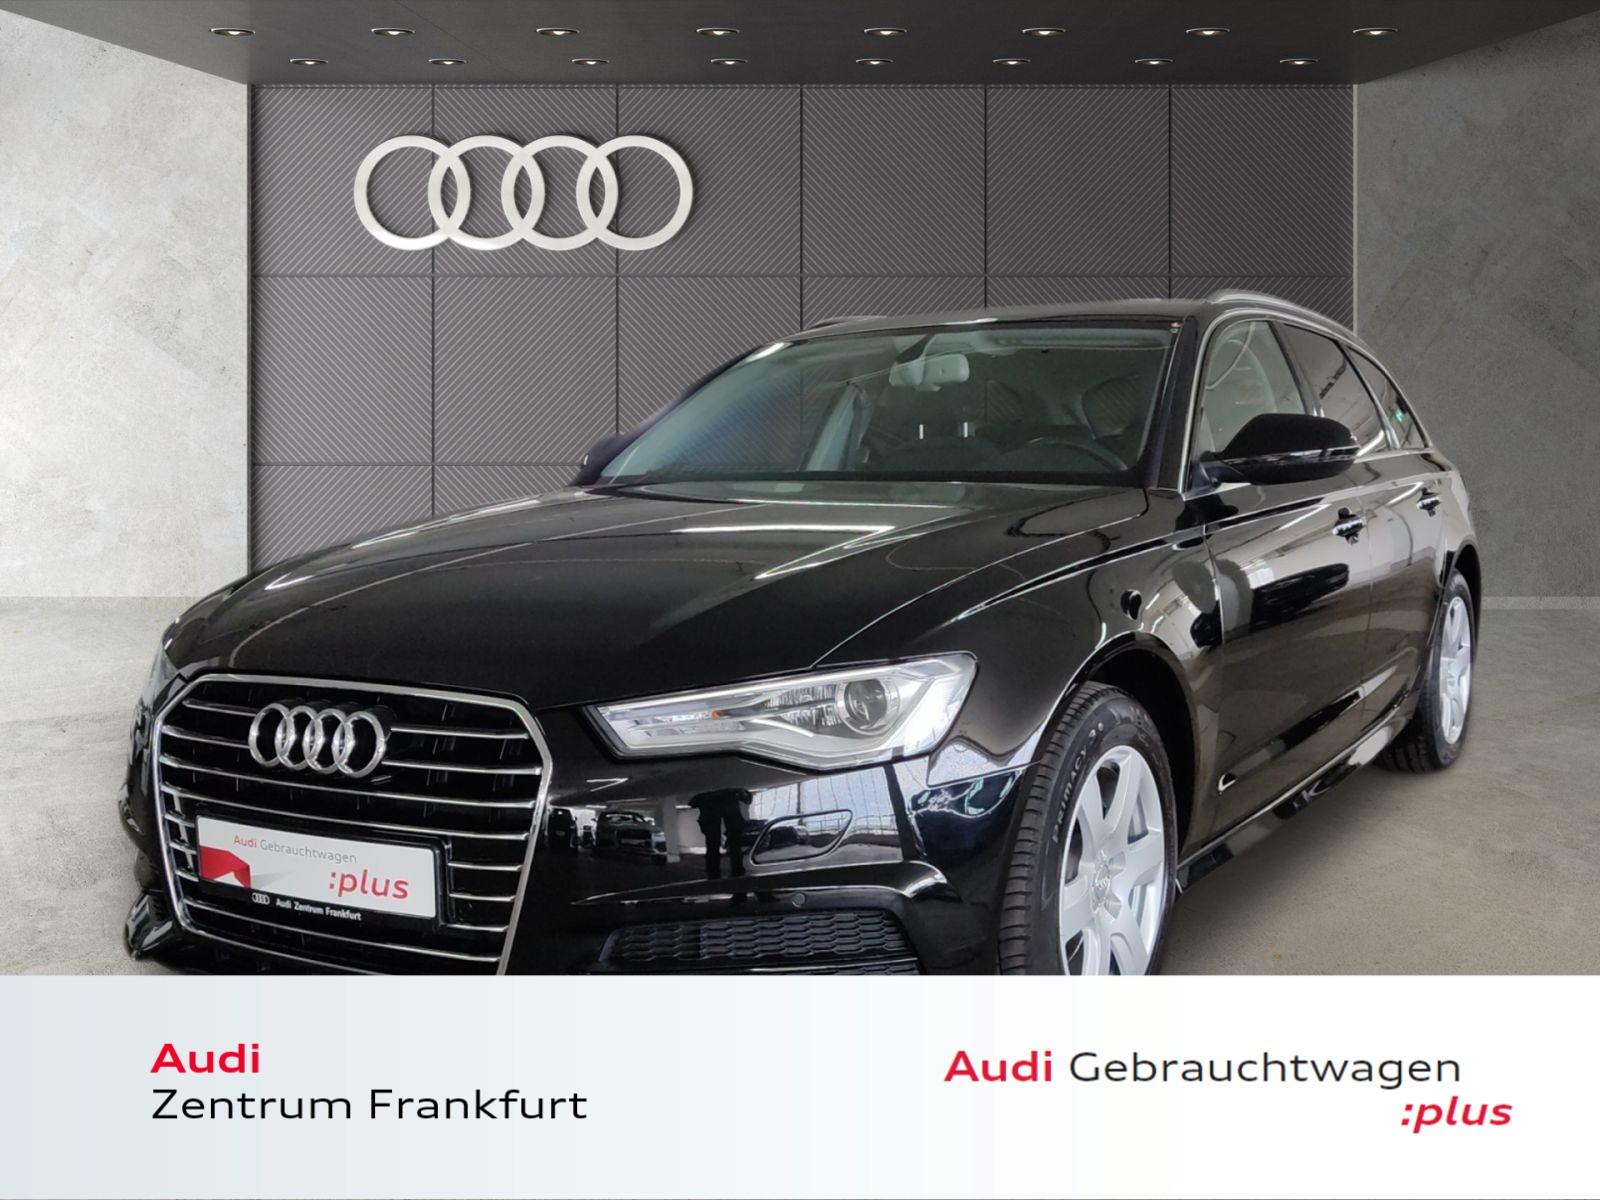 Audi A6 Avant 2.0 TDI ultra S tronic Xenon Pano DWA Navi PDC Sitzheizung, Jahr 2018, Diesel